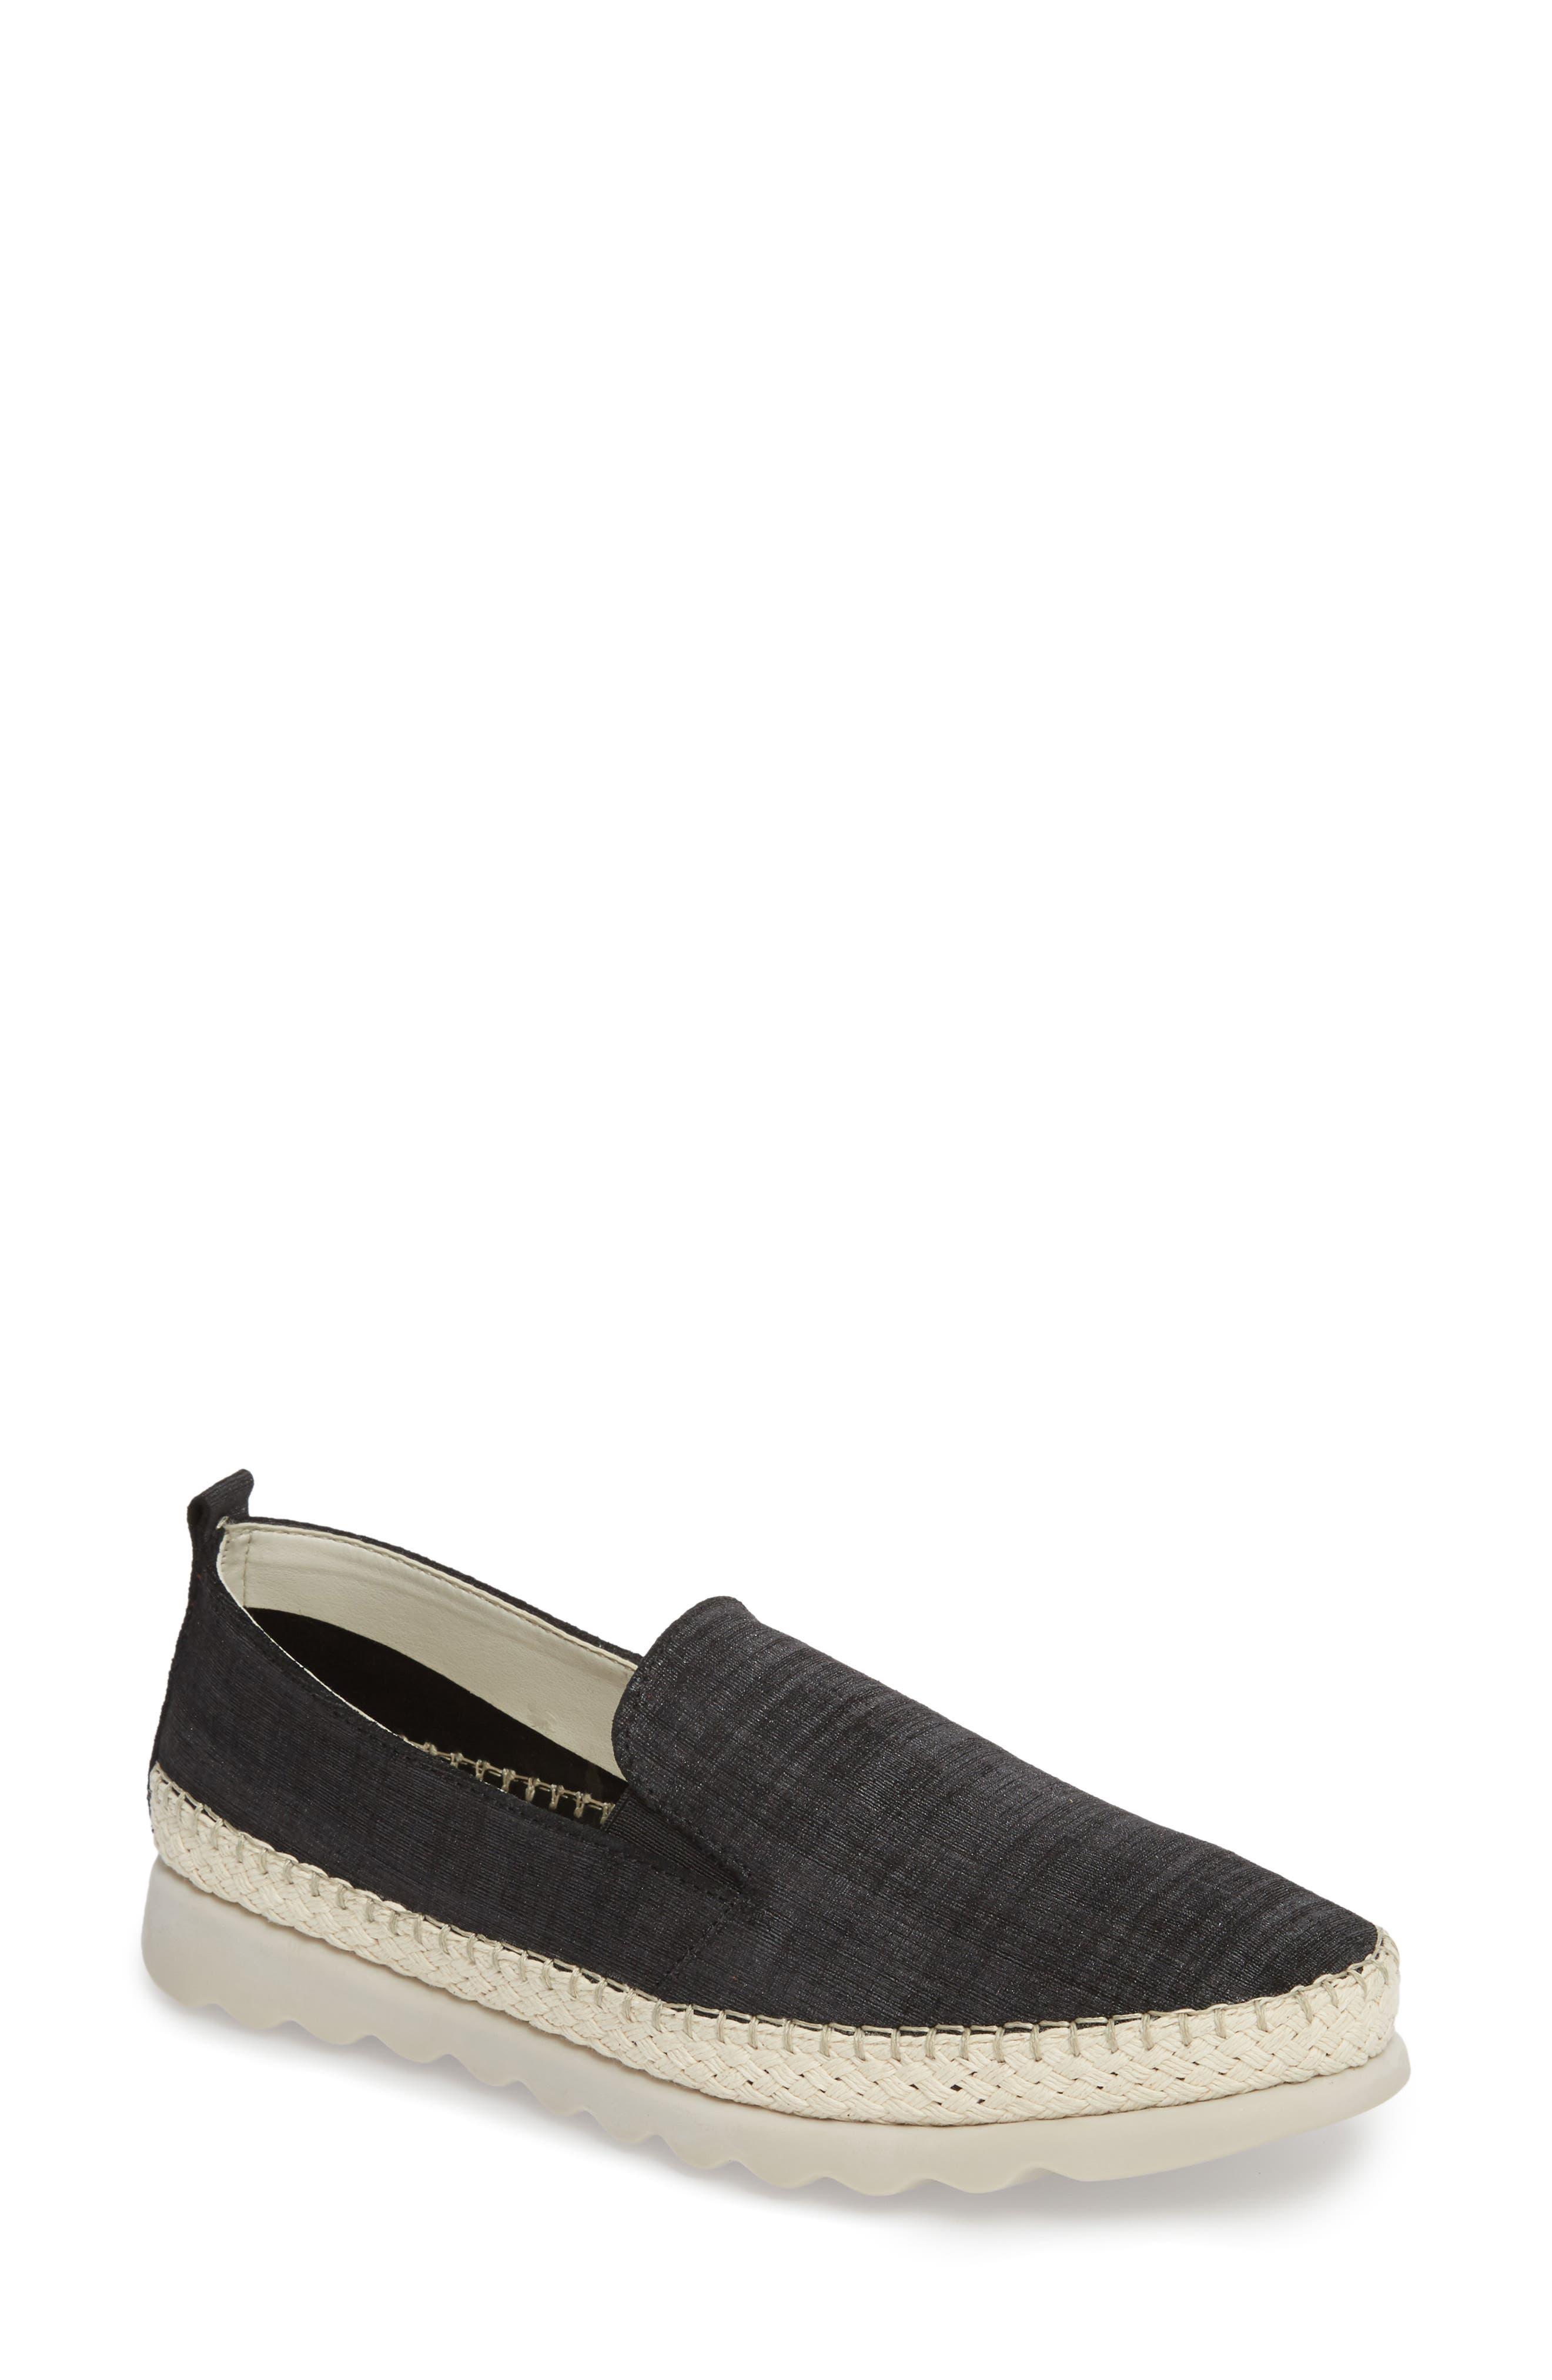 Chappie Slip-On Sneaker,                             Main thumbnail 1, color,